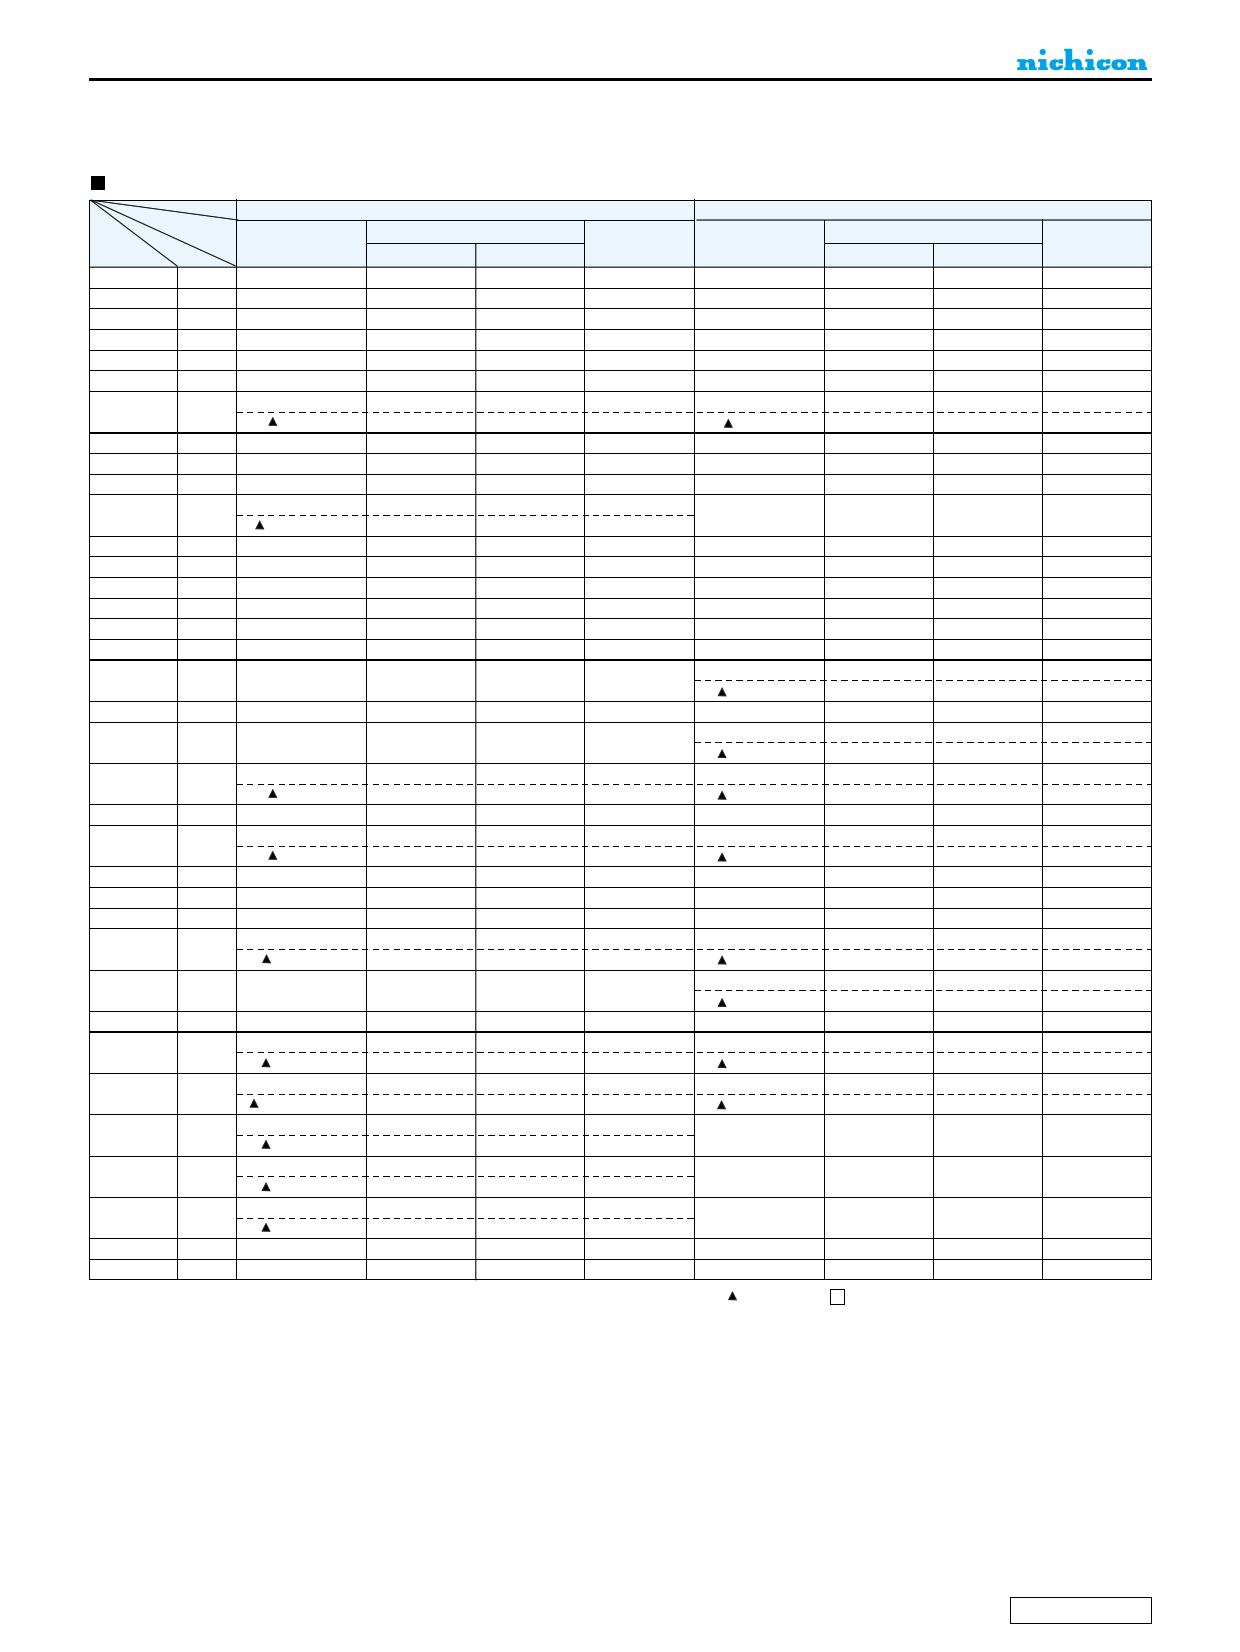 UPW2C100MPD pdf, 반도체, 판매, 대치품